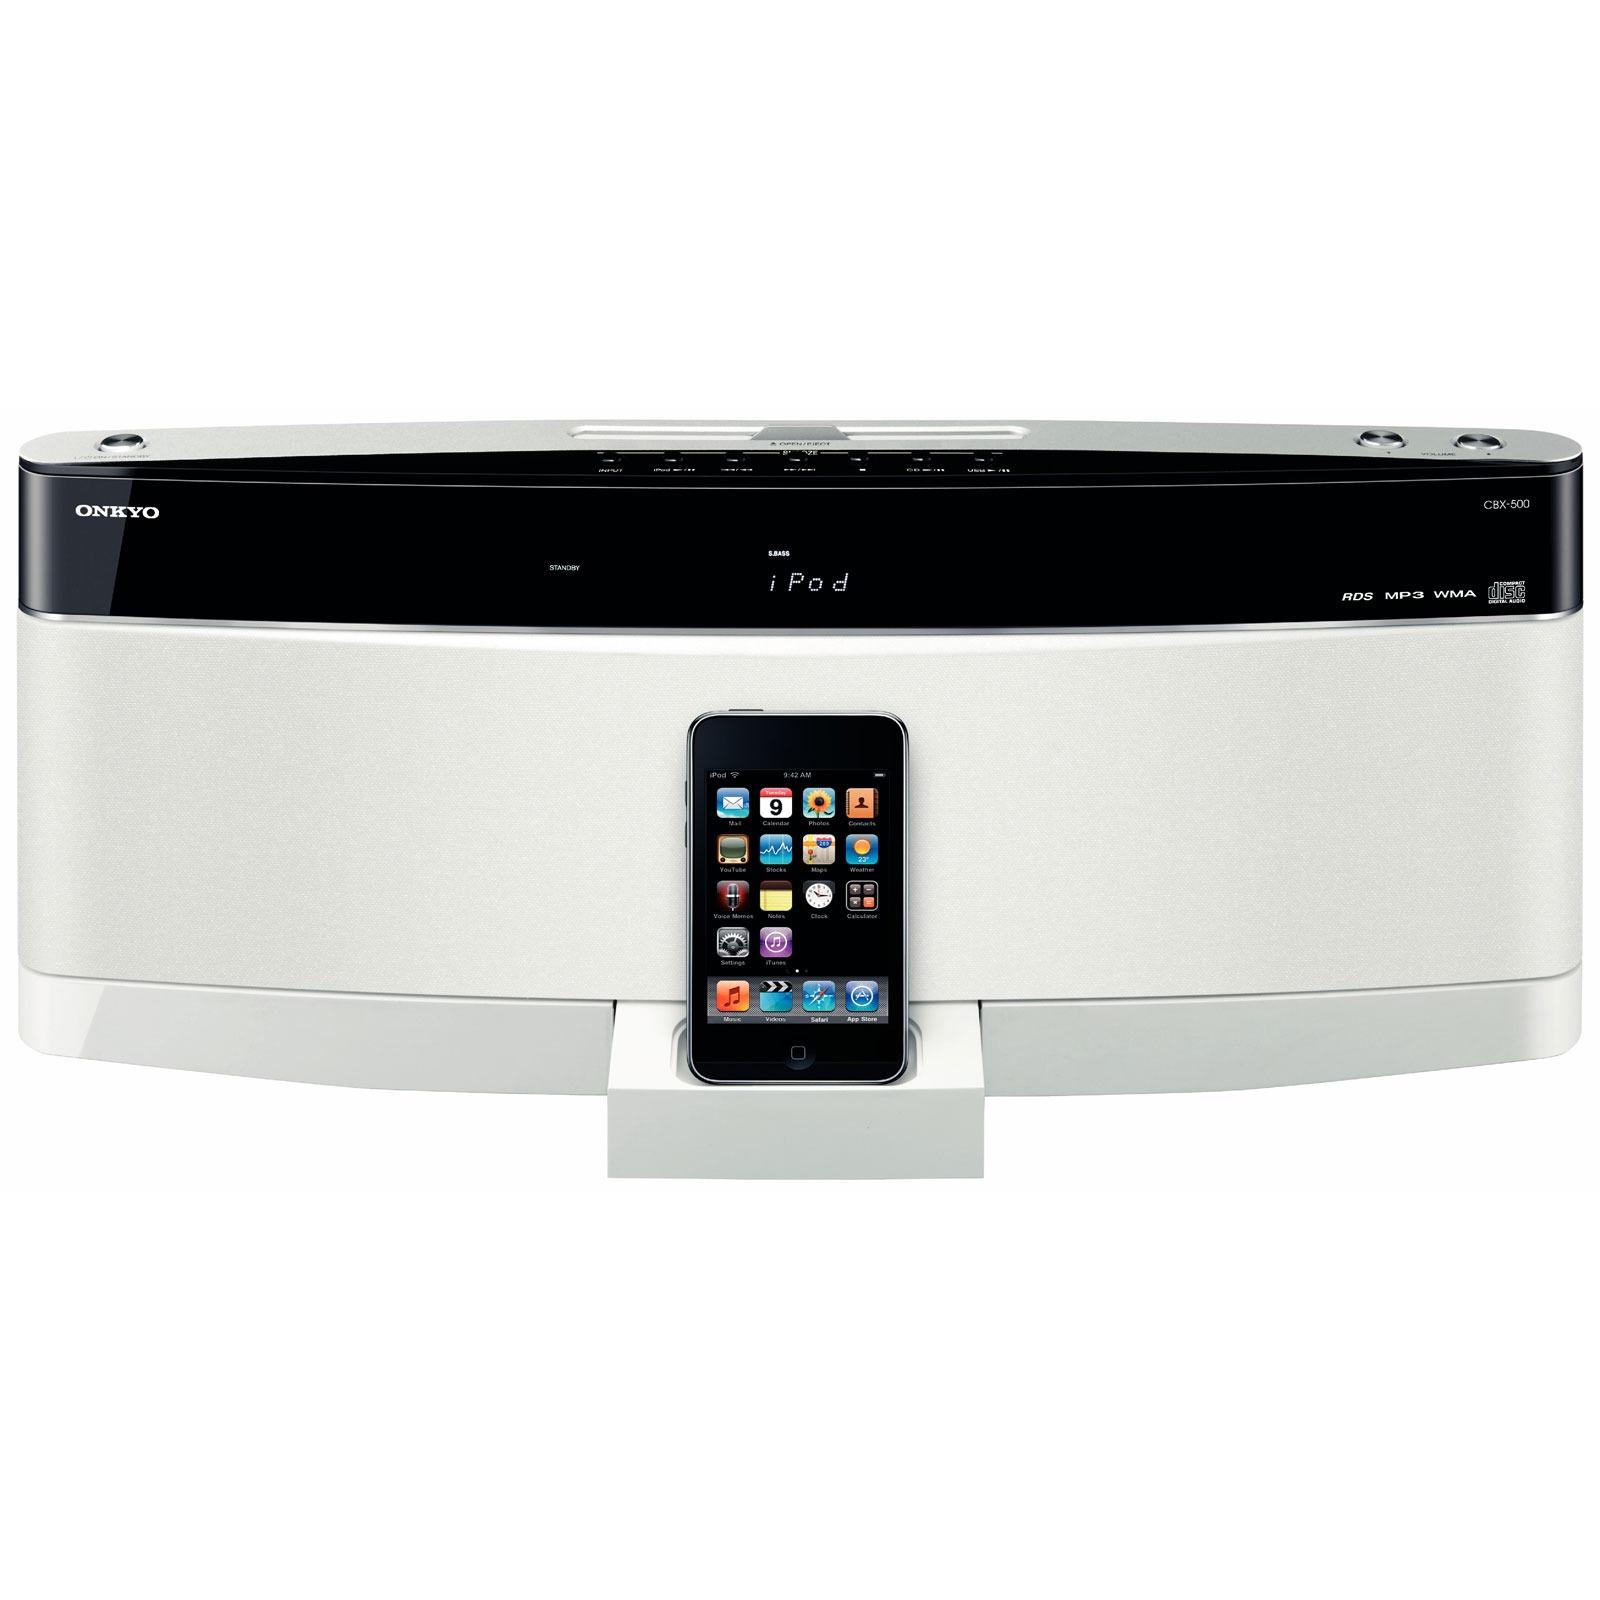 onkyo cbx 500 blanc apple ipod touch 8 go dock enceinte bluetooth onkyo sur ldlc. Black Bedroom Furniture Sets. Home Design Ideas